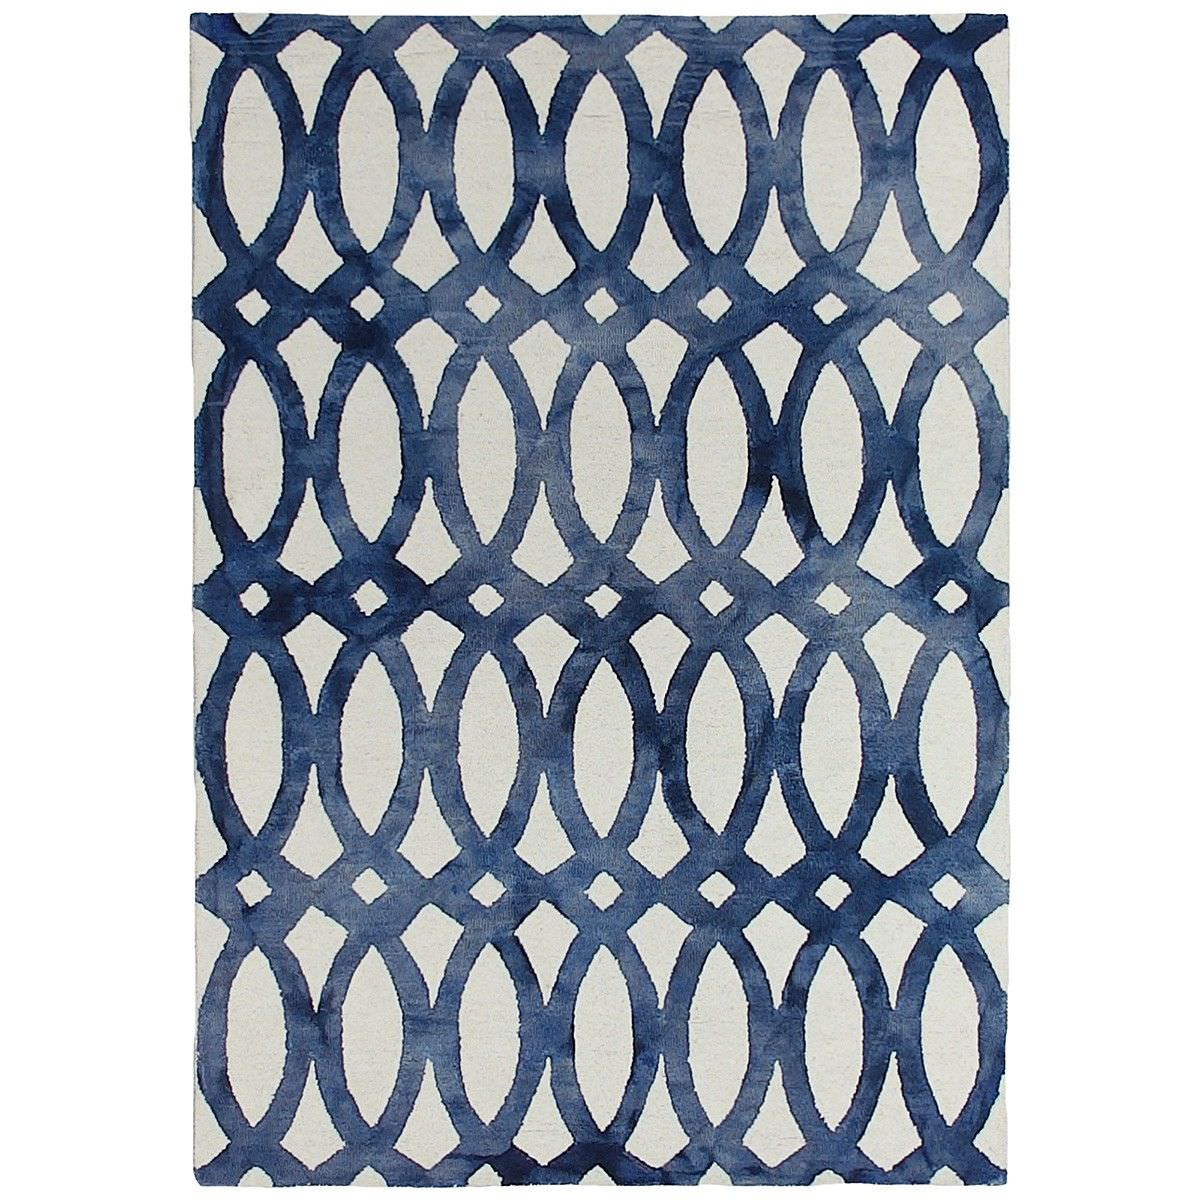 Dip Dye Hand Tufted Wool Rug, 200x300cm, Navy